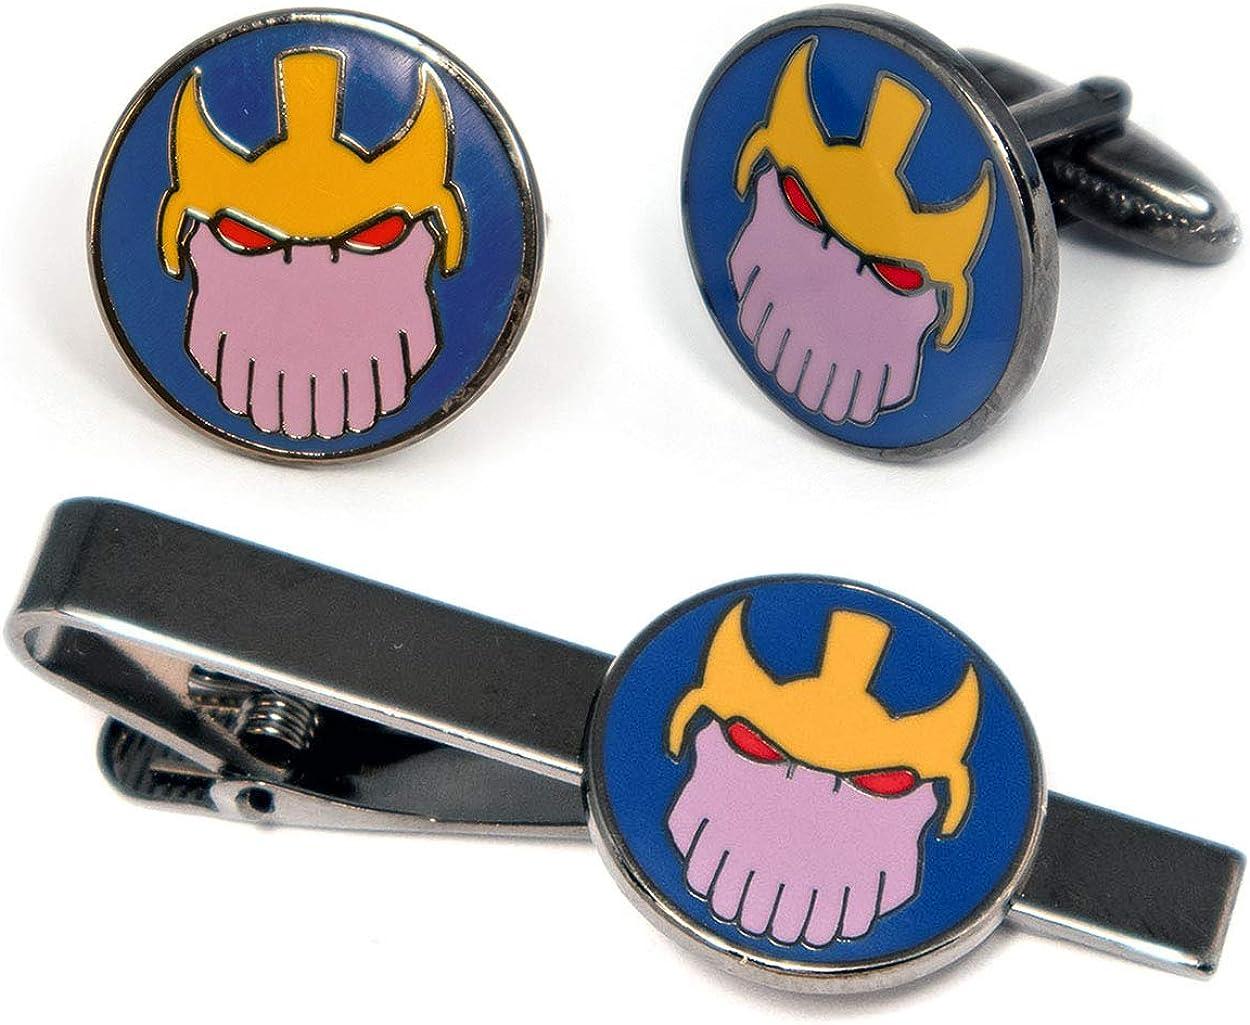 Thanos Cufflinks, Avengers Infinity Gauntlet Tie Clip, Infinity Stones Jewelry, Iron Man Tie Tack Geek Gifts, Minimalist Superhero Captain America Cuff Links Wedding Party Groomsmen Gift